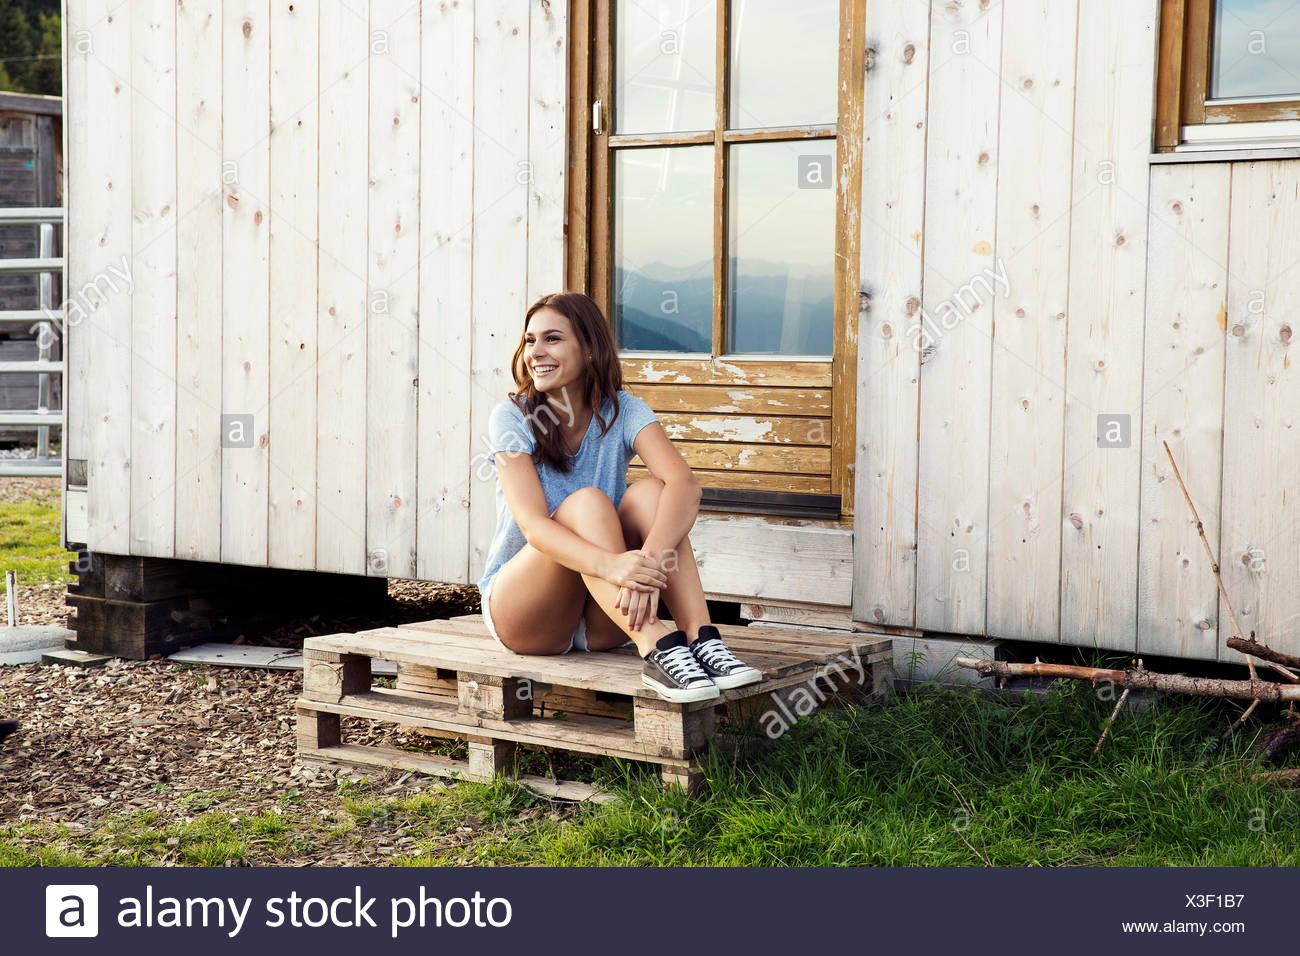 0f9f4e12d Young woman sitting on pallets outside chalet, Sattelbergalm, Tirol, Austria